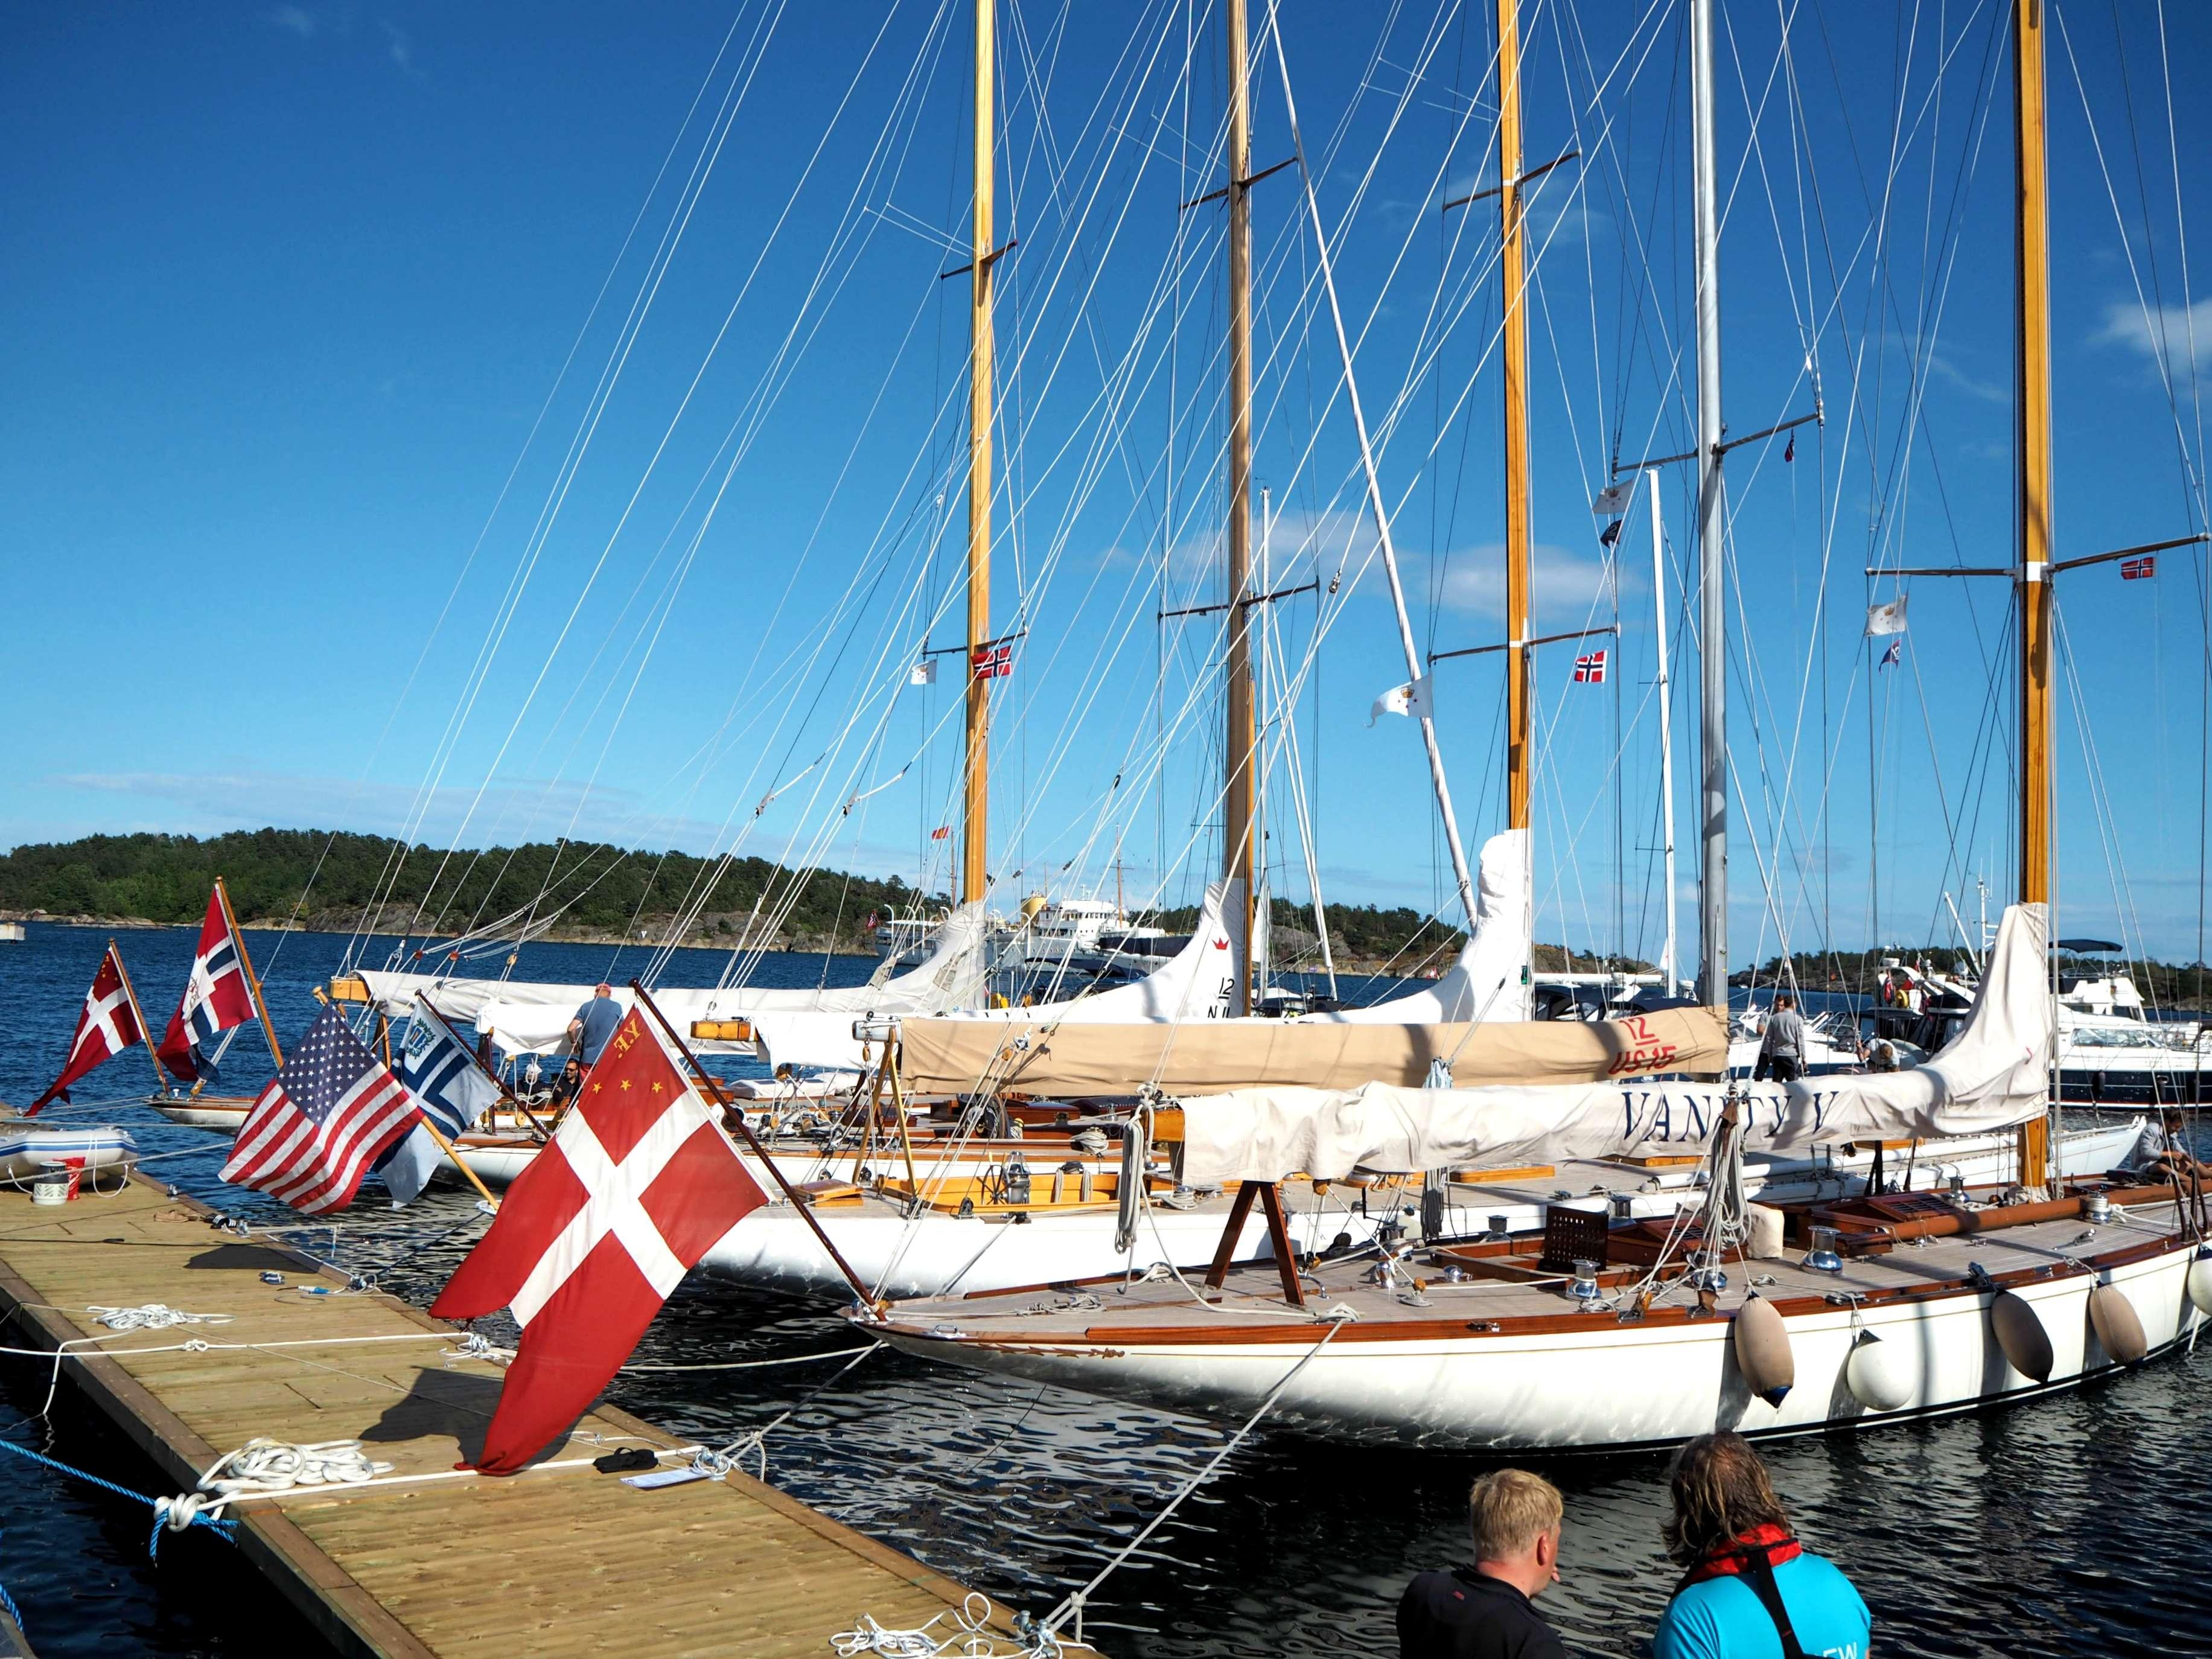 Wooden boat festival in Risør